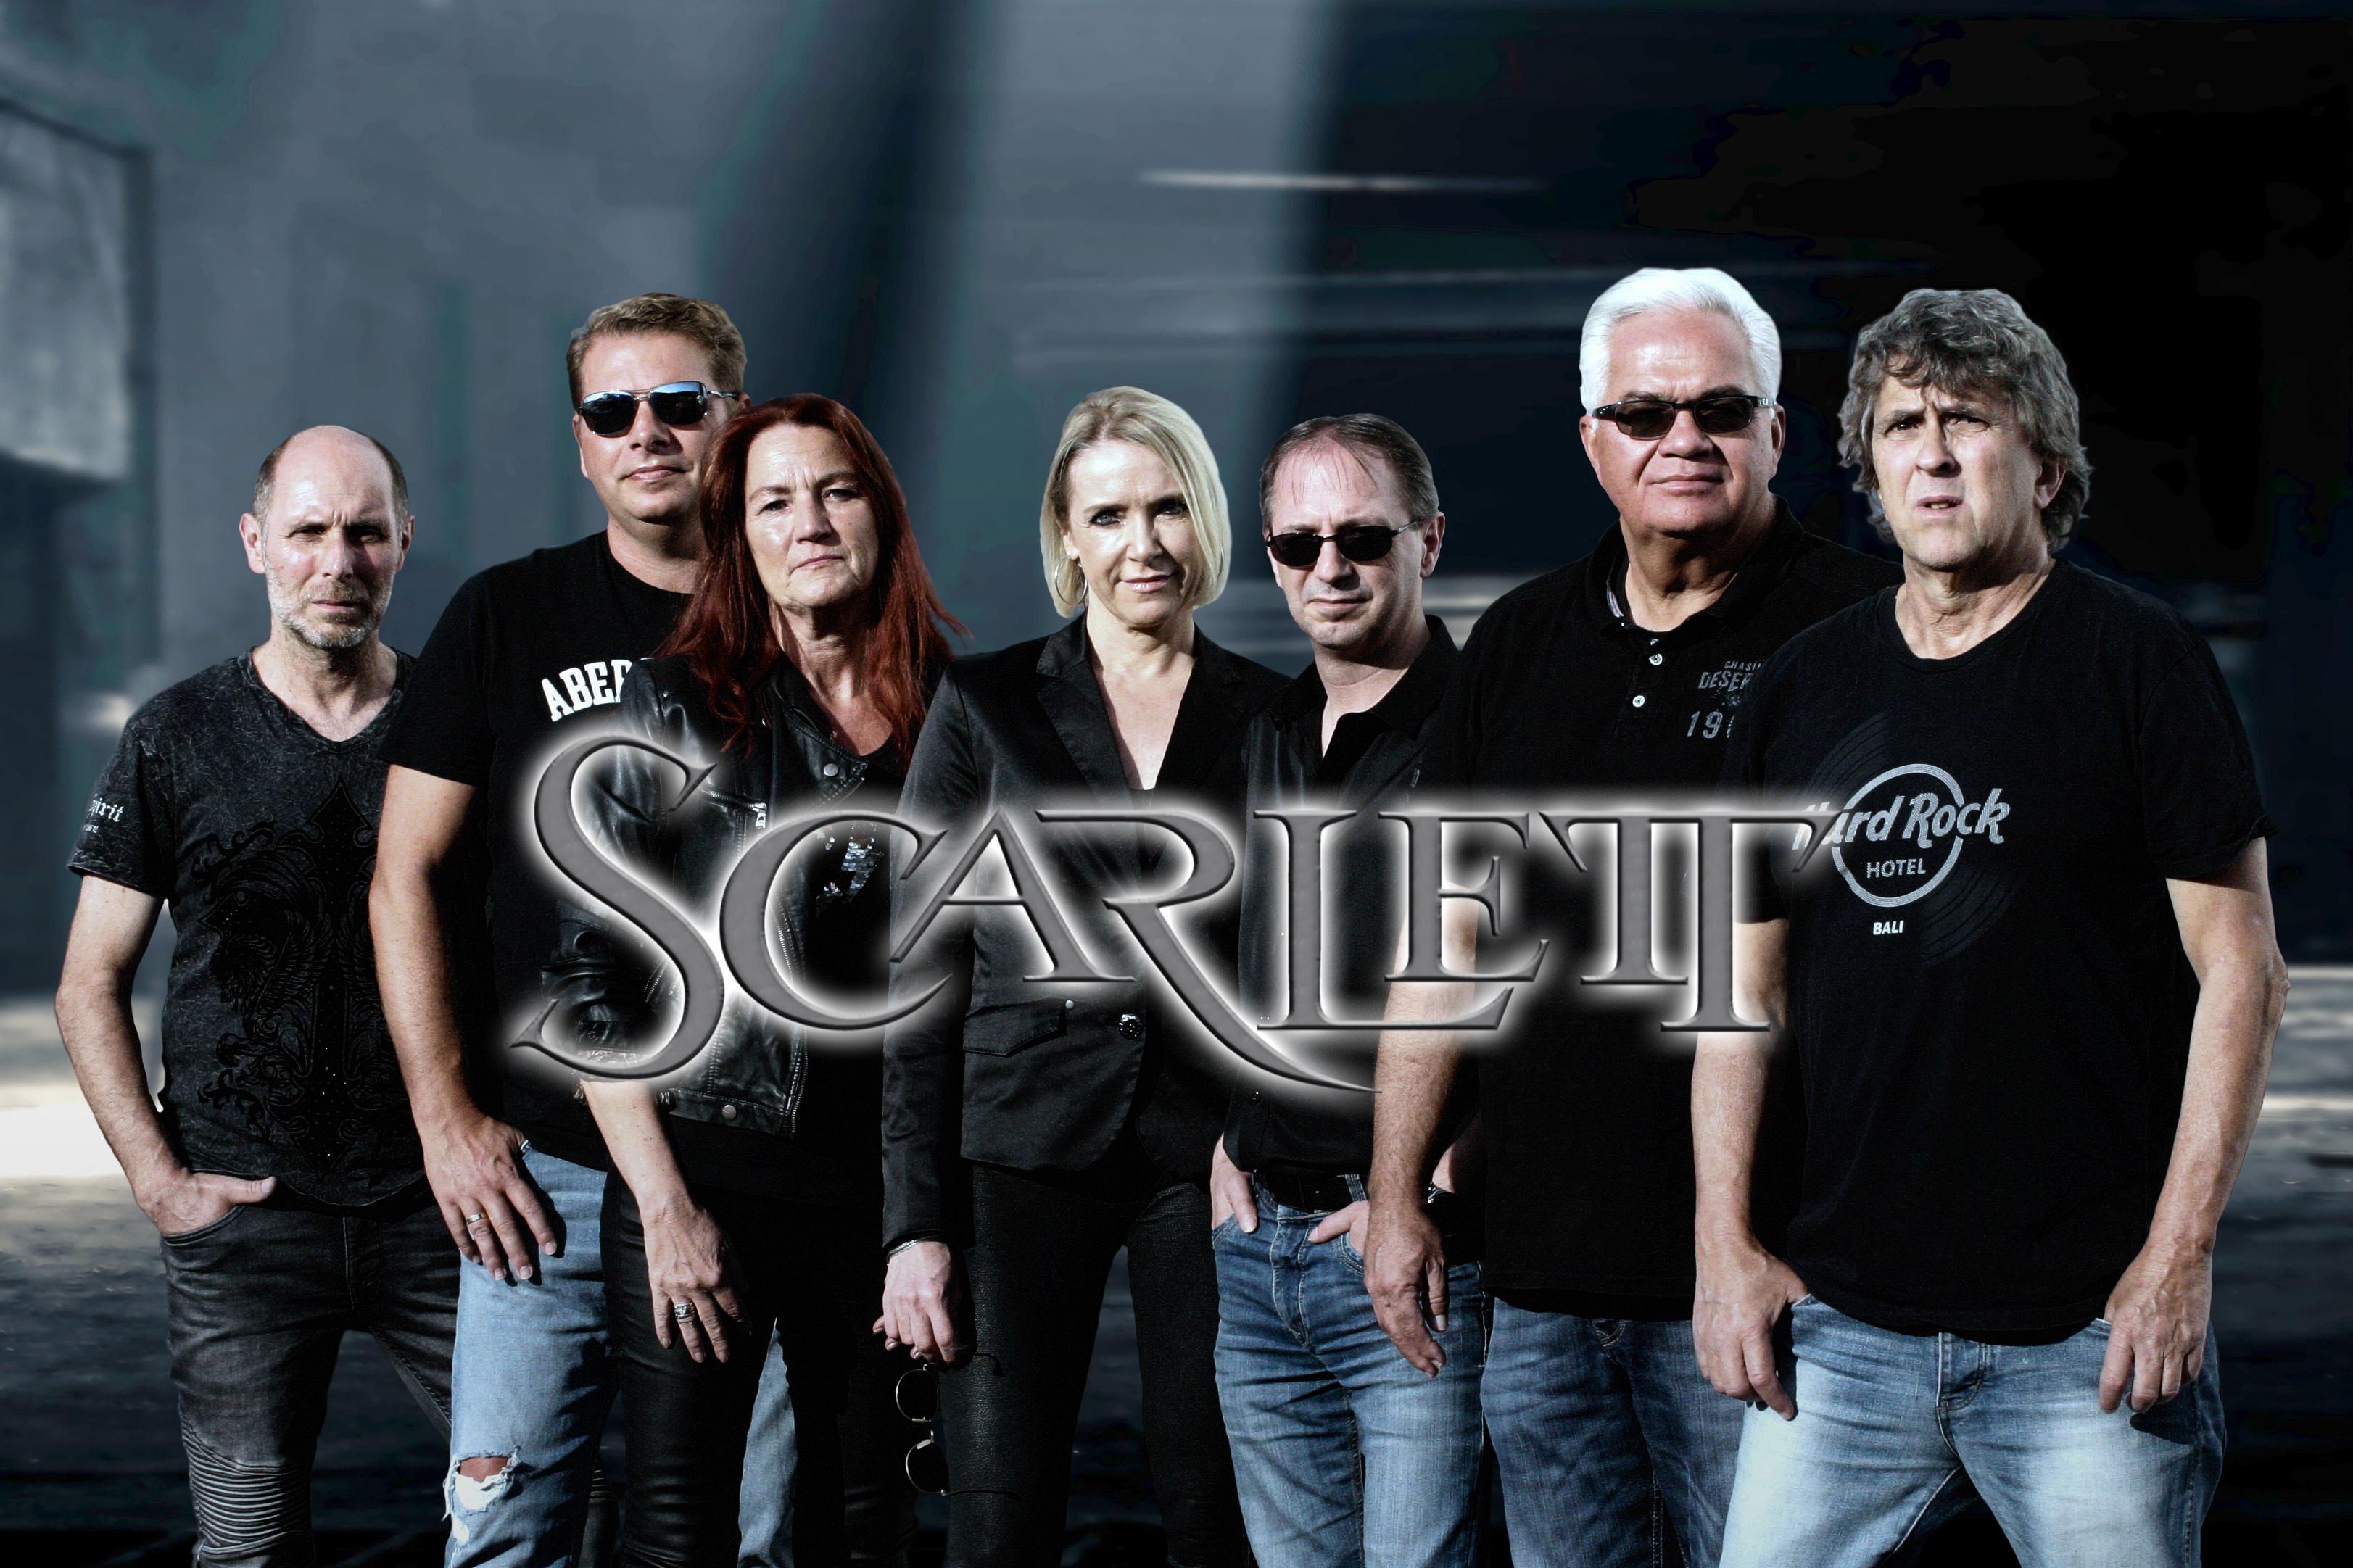 Scarlett Bandfoto mit Logo